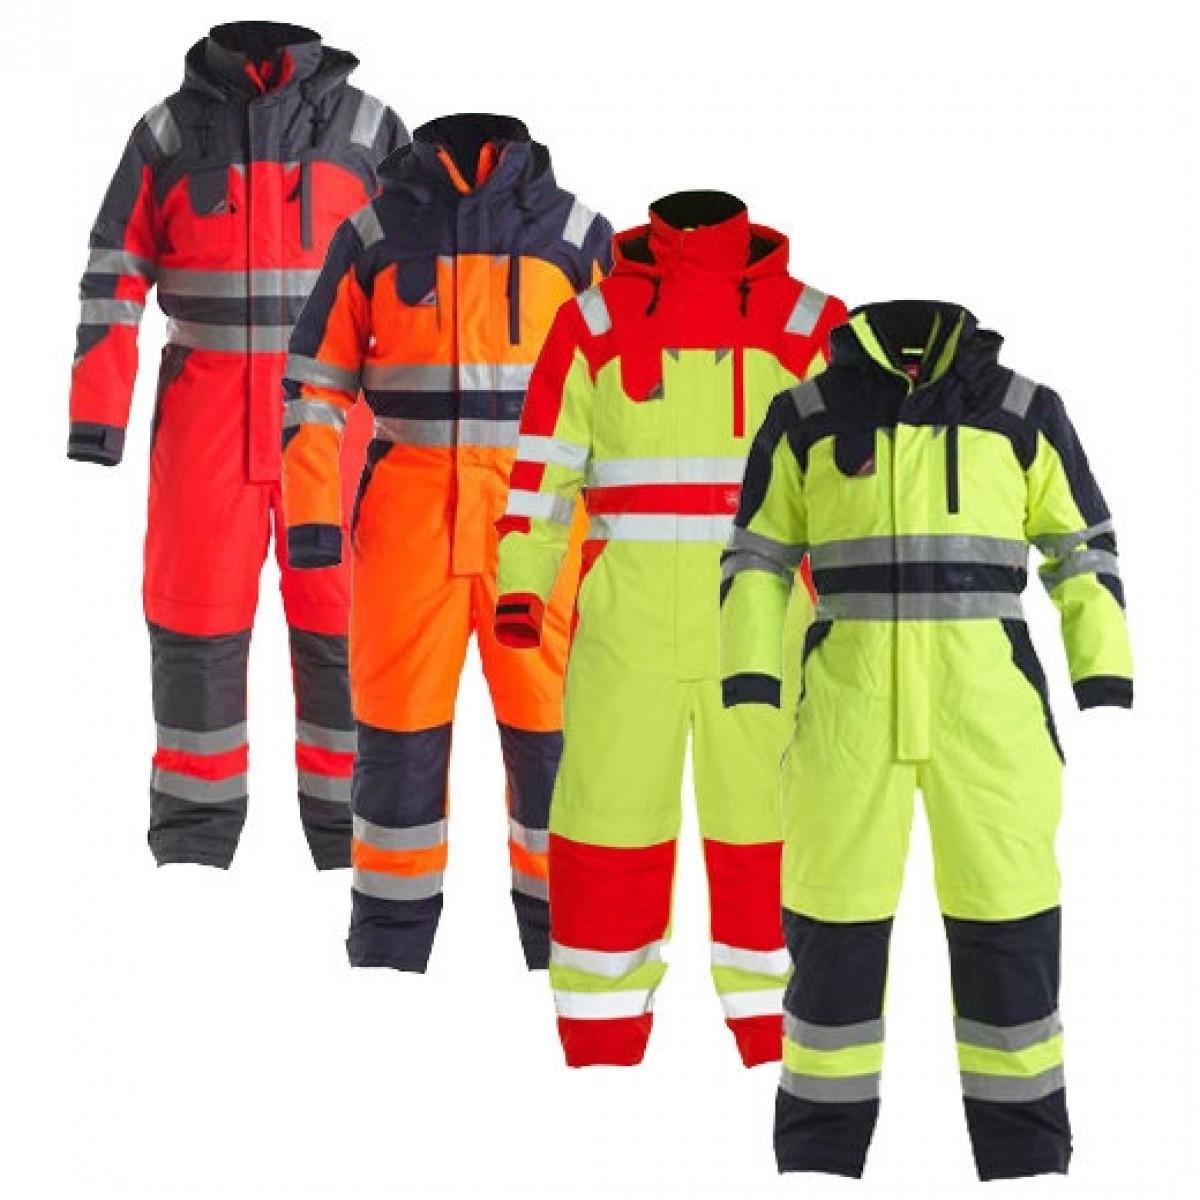 F. Engel Termokedeldragt Safety EN ISO 20471-31